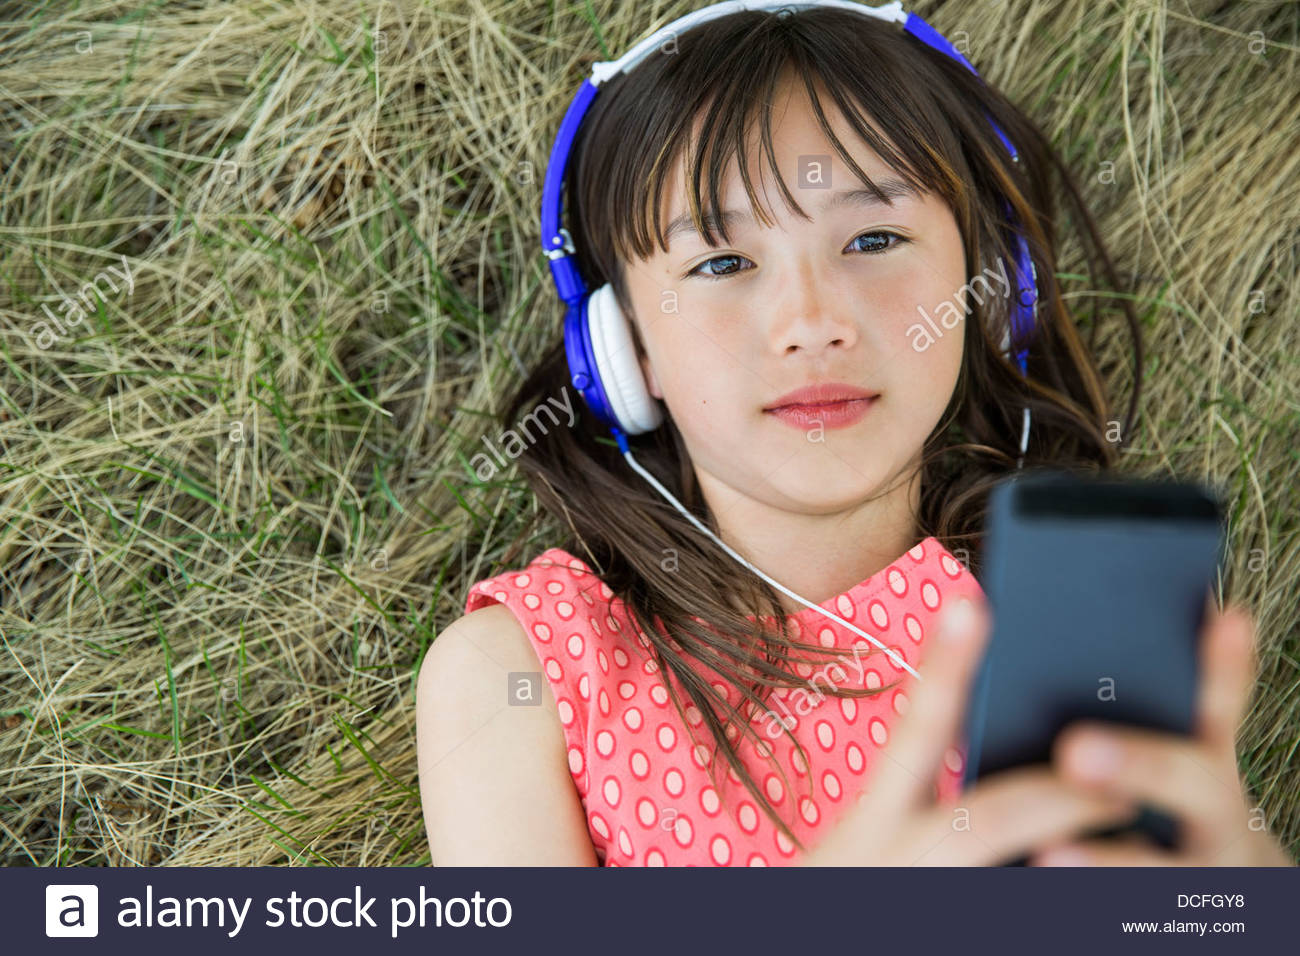 Girl lying down listening to headphones - Stock Image